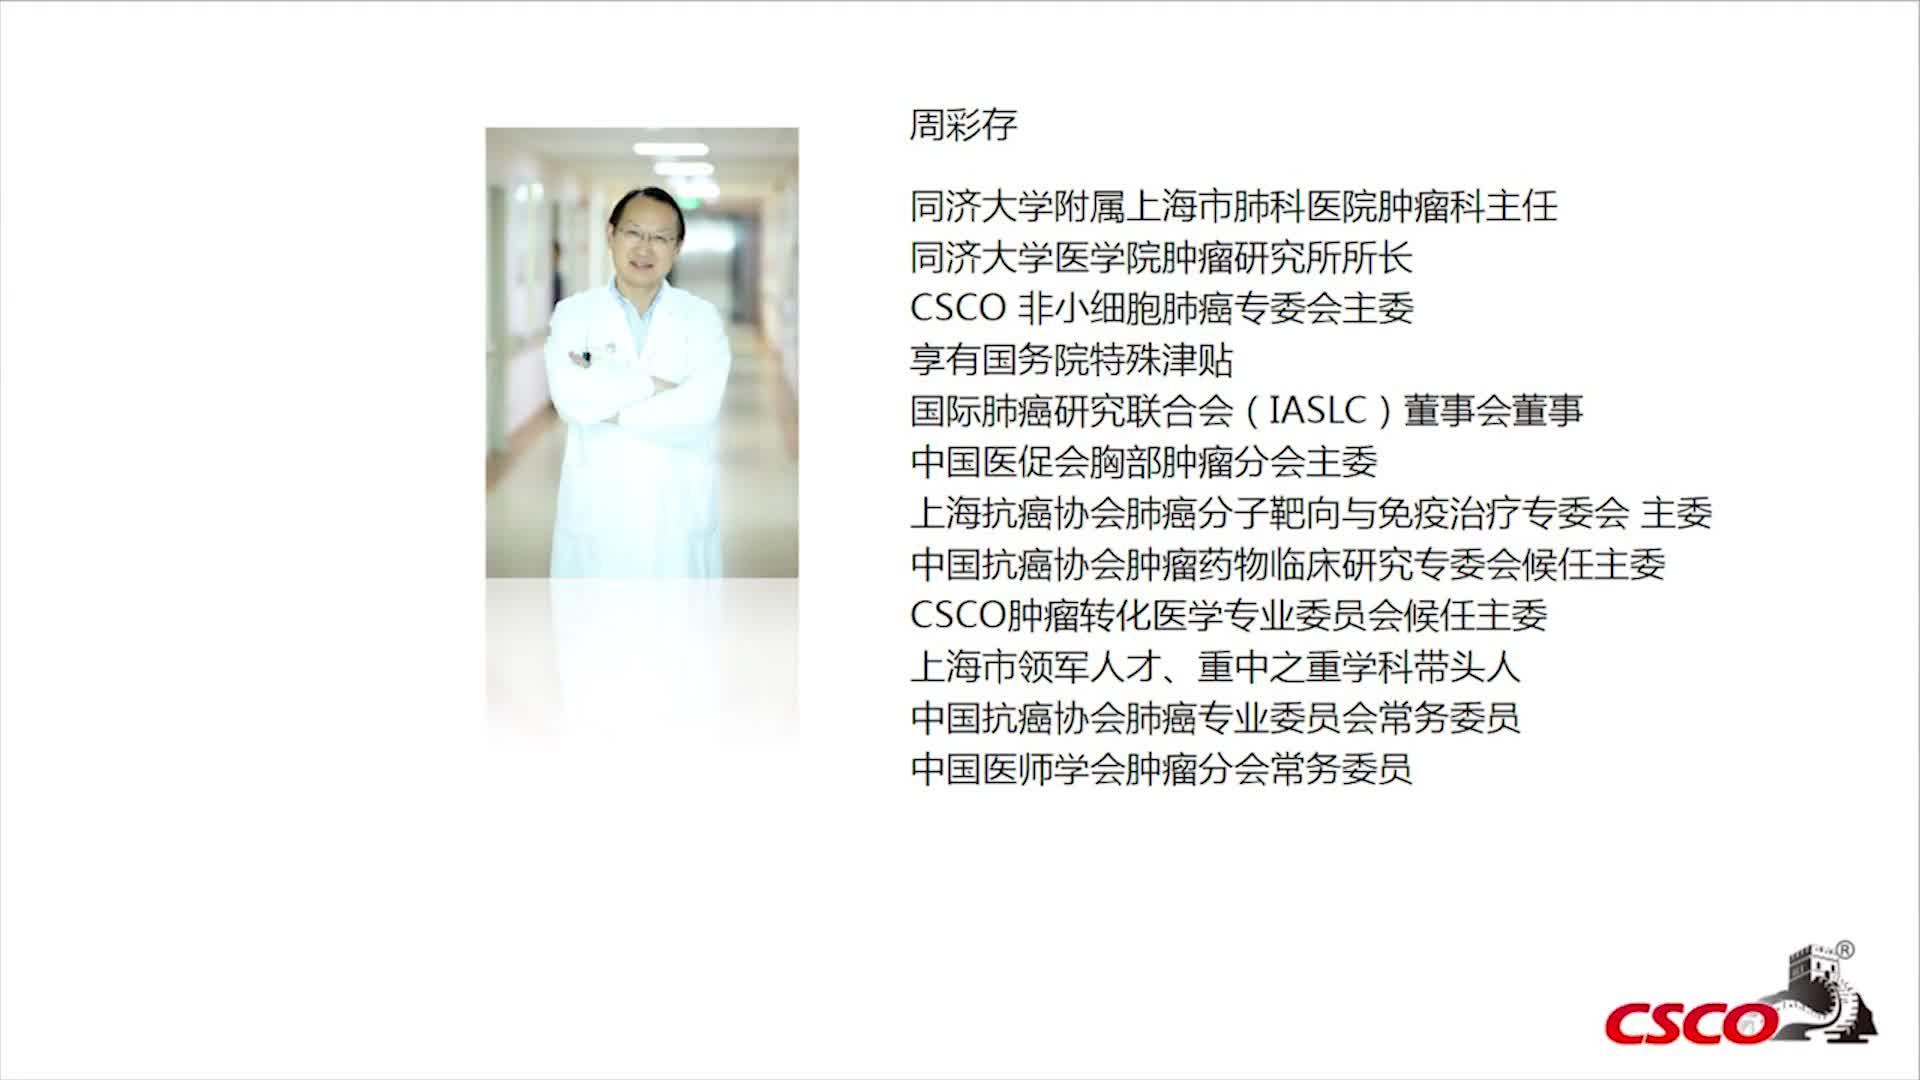 IMpower110:在经PD-L1选择的NSCLC患者中, 阿替利珠单抗 (Atezo)vs. 含铂化疗 (化疗)1L治疗的 III期临床研究的中期OS分析